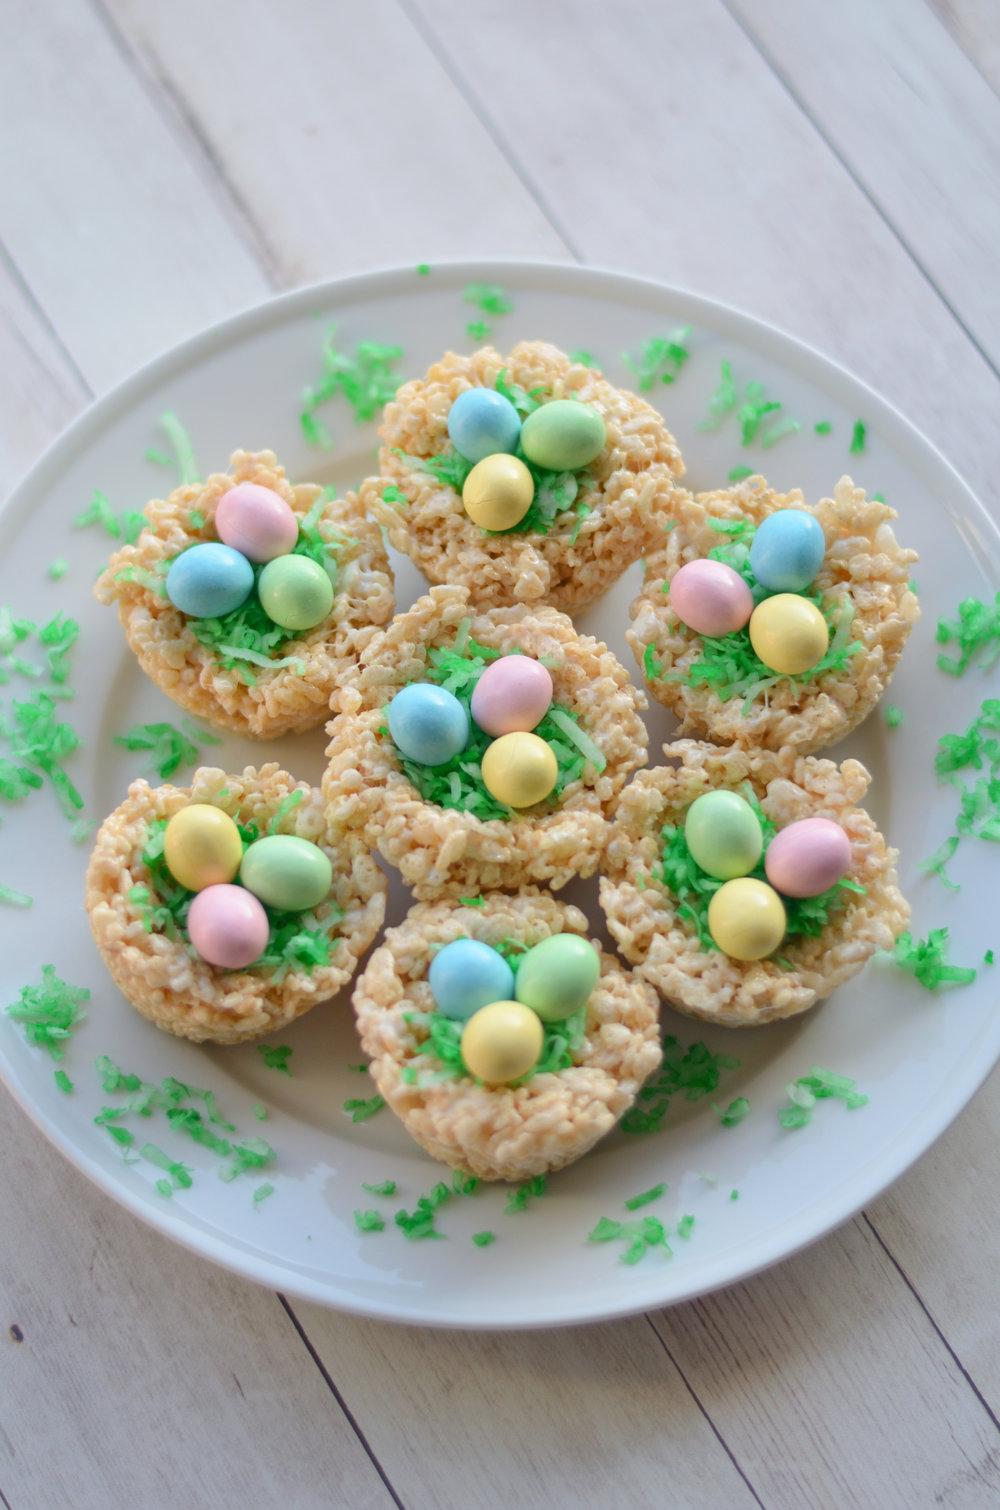 Robin's Egg Nests Easter Treat // CarolynWilliamsRD.com